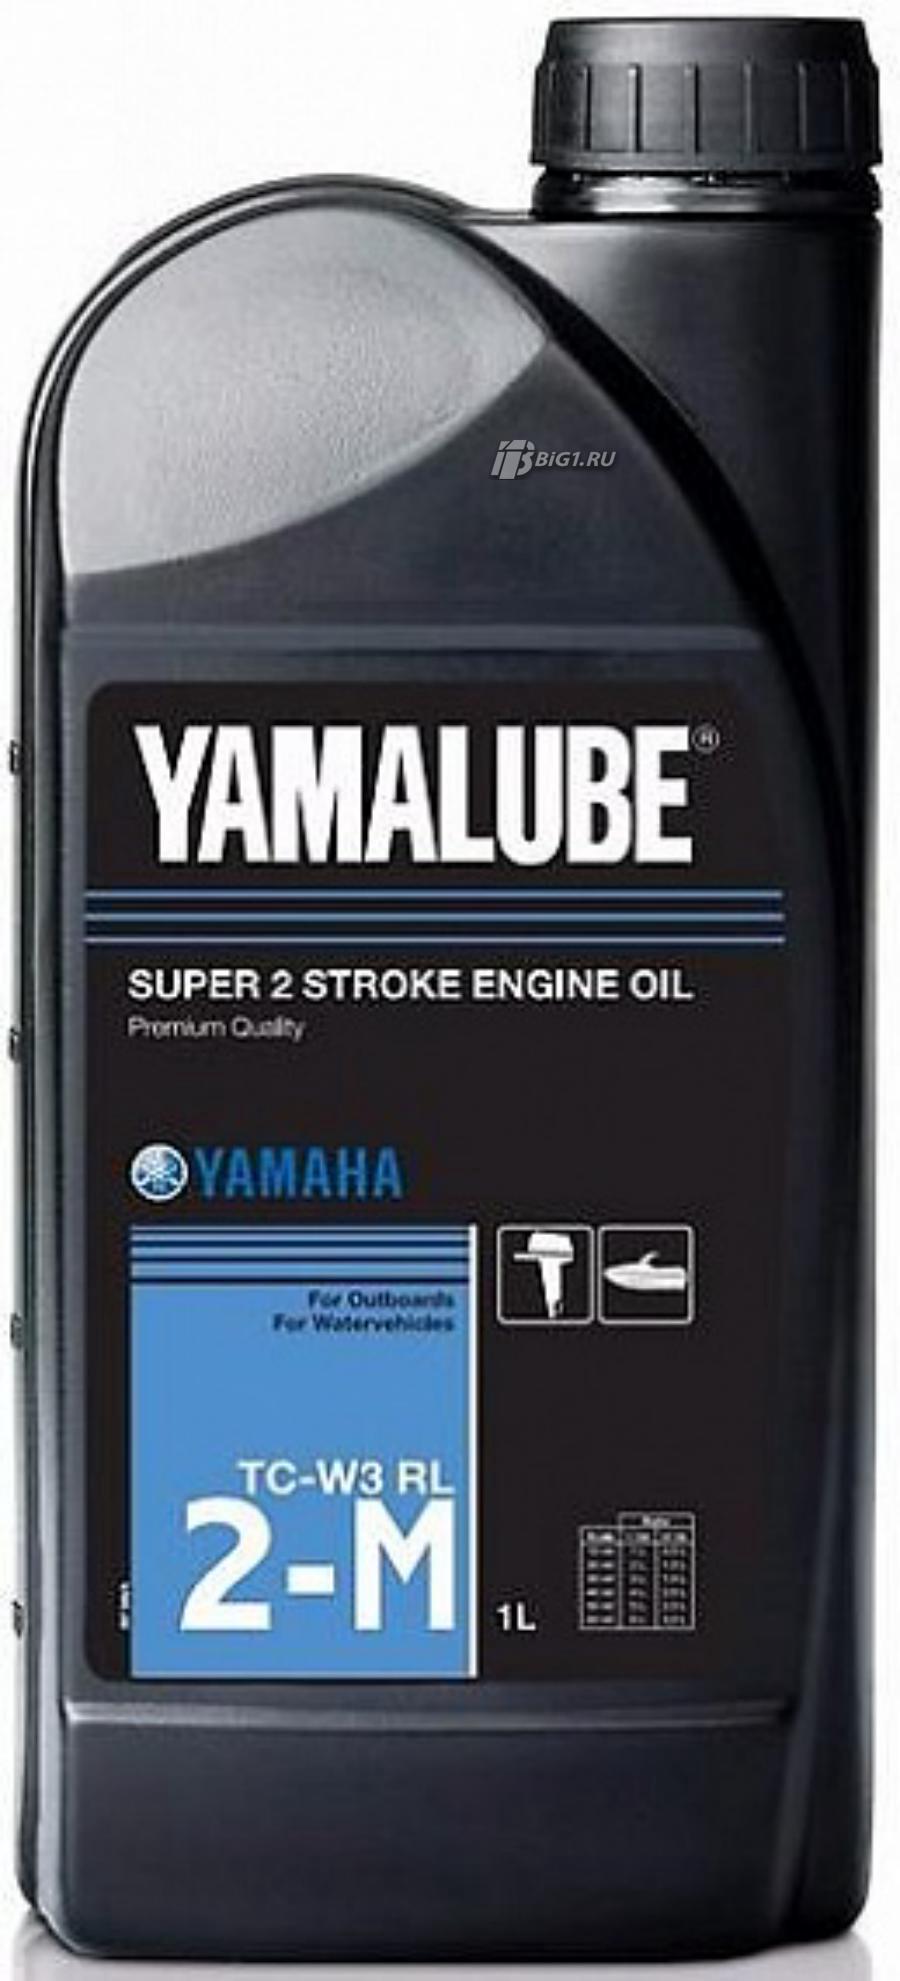 YAMAHA Yamalube 2-M